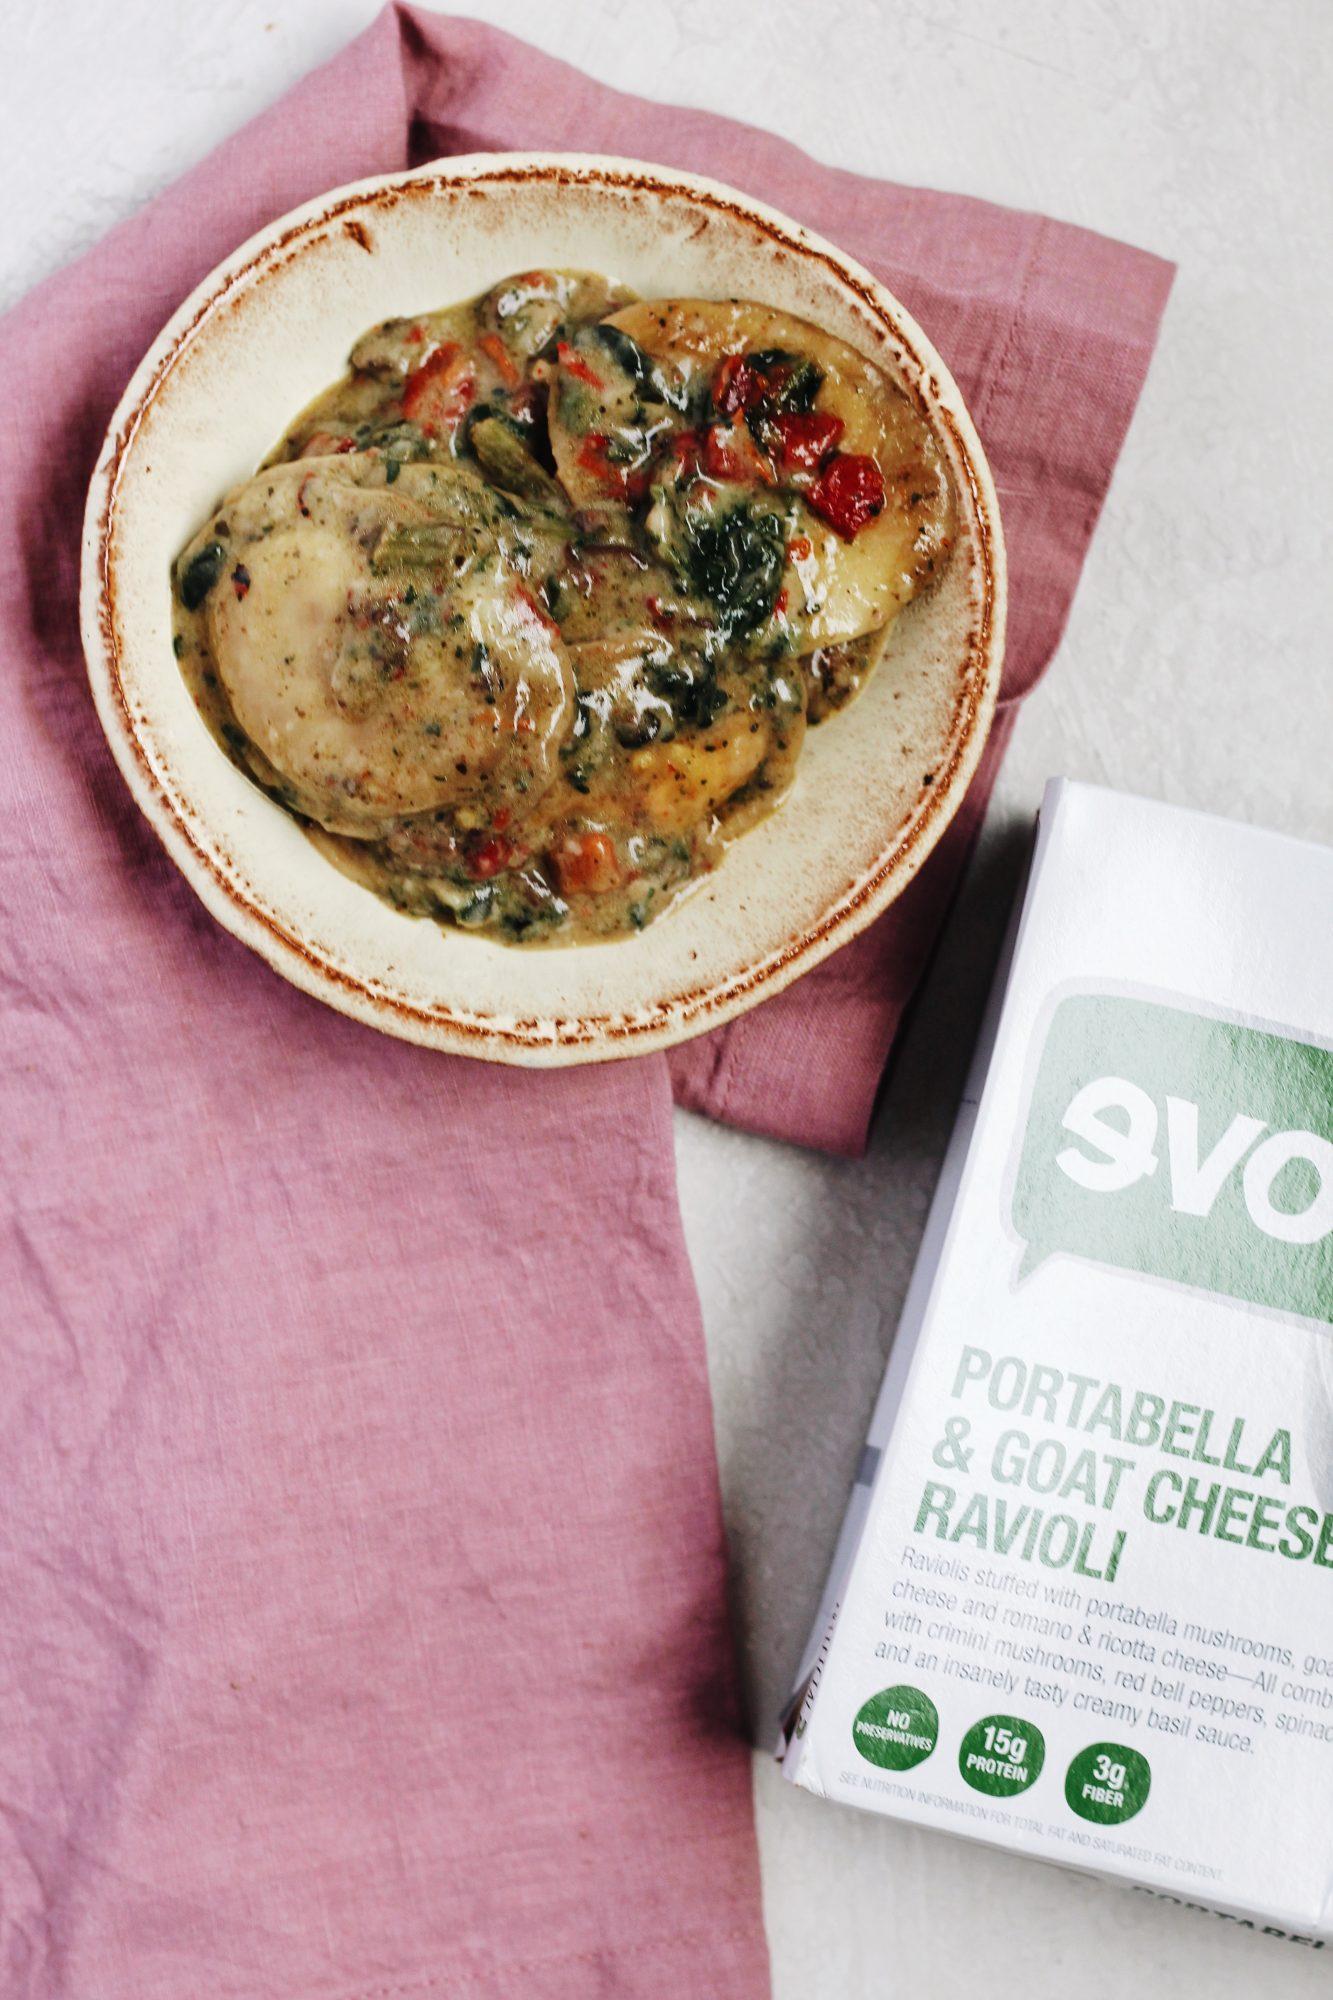 Evol Portabella & Goat Cheese Ravioli is a delicious frozen meal